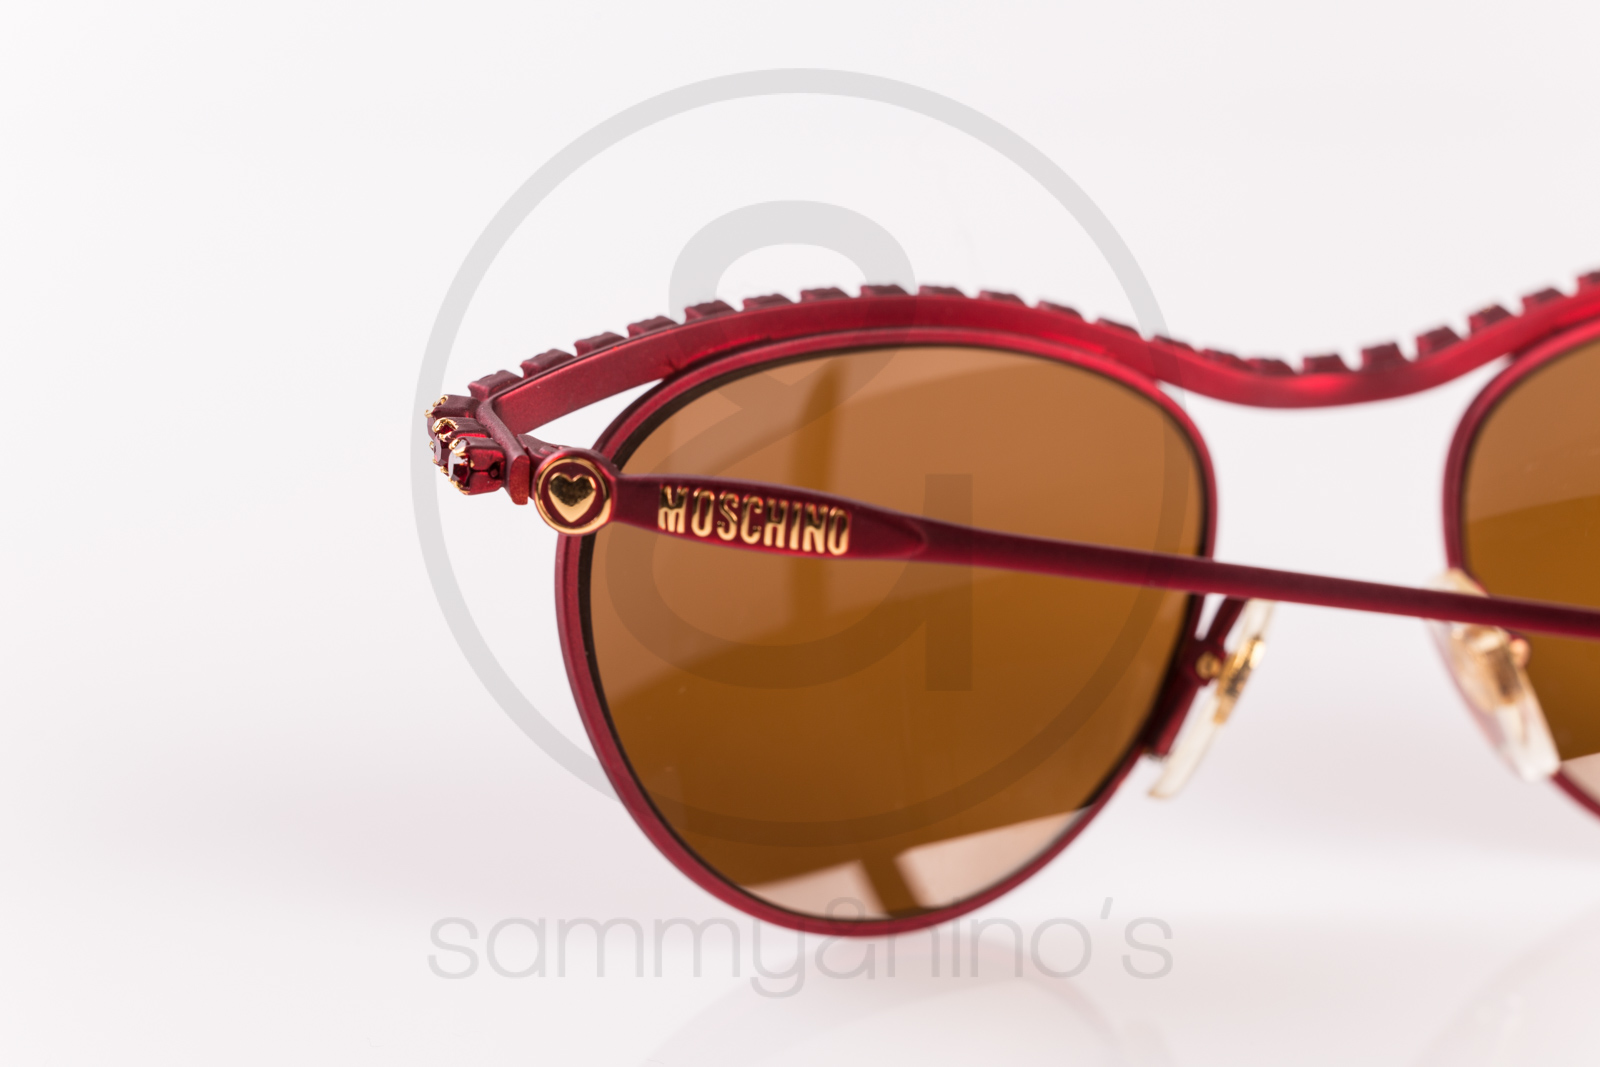 6ffb52bdd42 Moschino by Persol MM843 – Sammy   Nino s Store